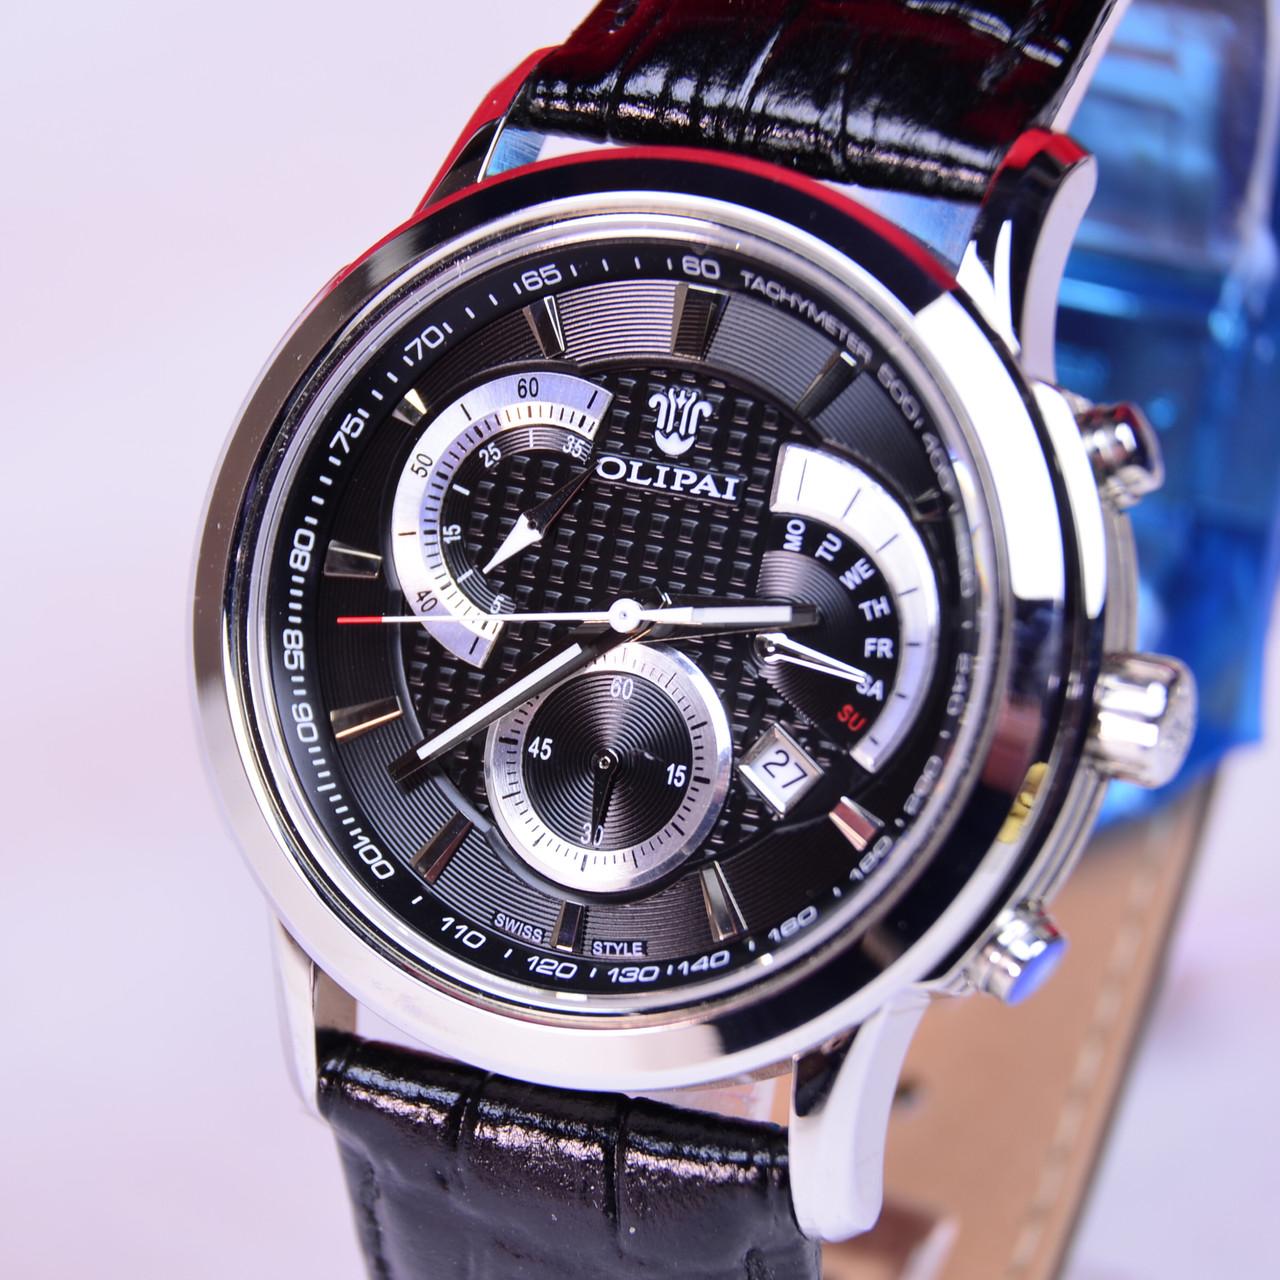 Мужские наручные часы OLIPAI JT6018 black сапфир,тахиметр